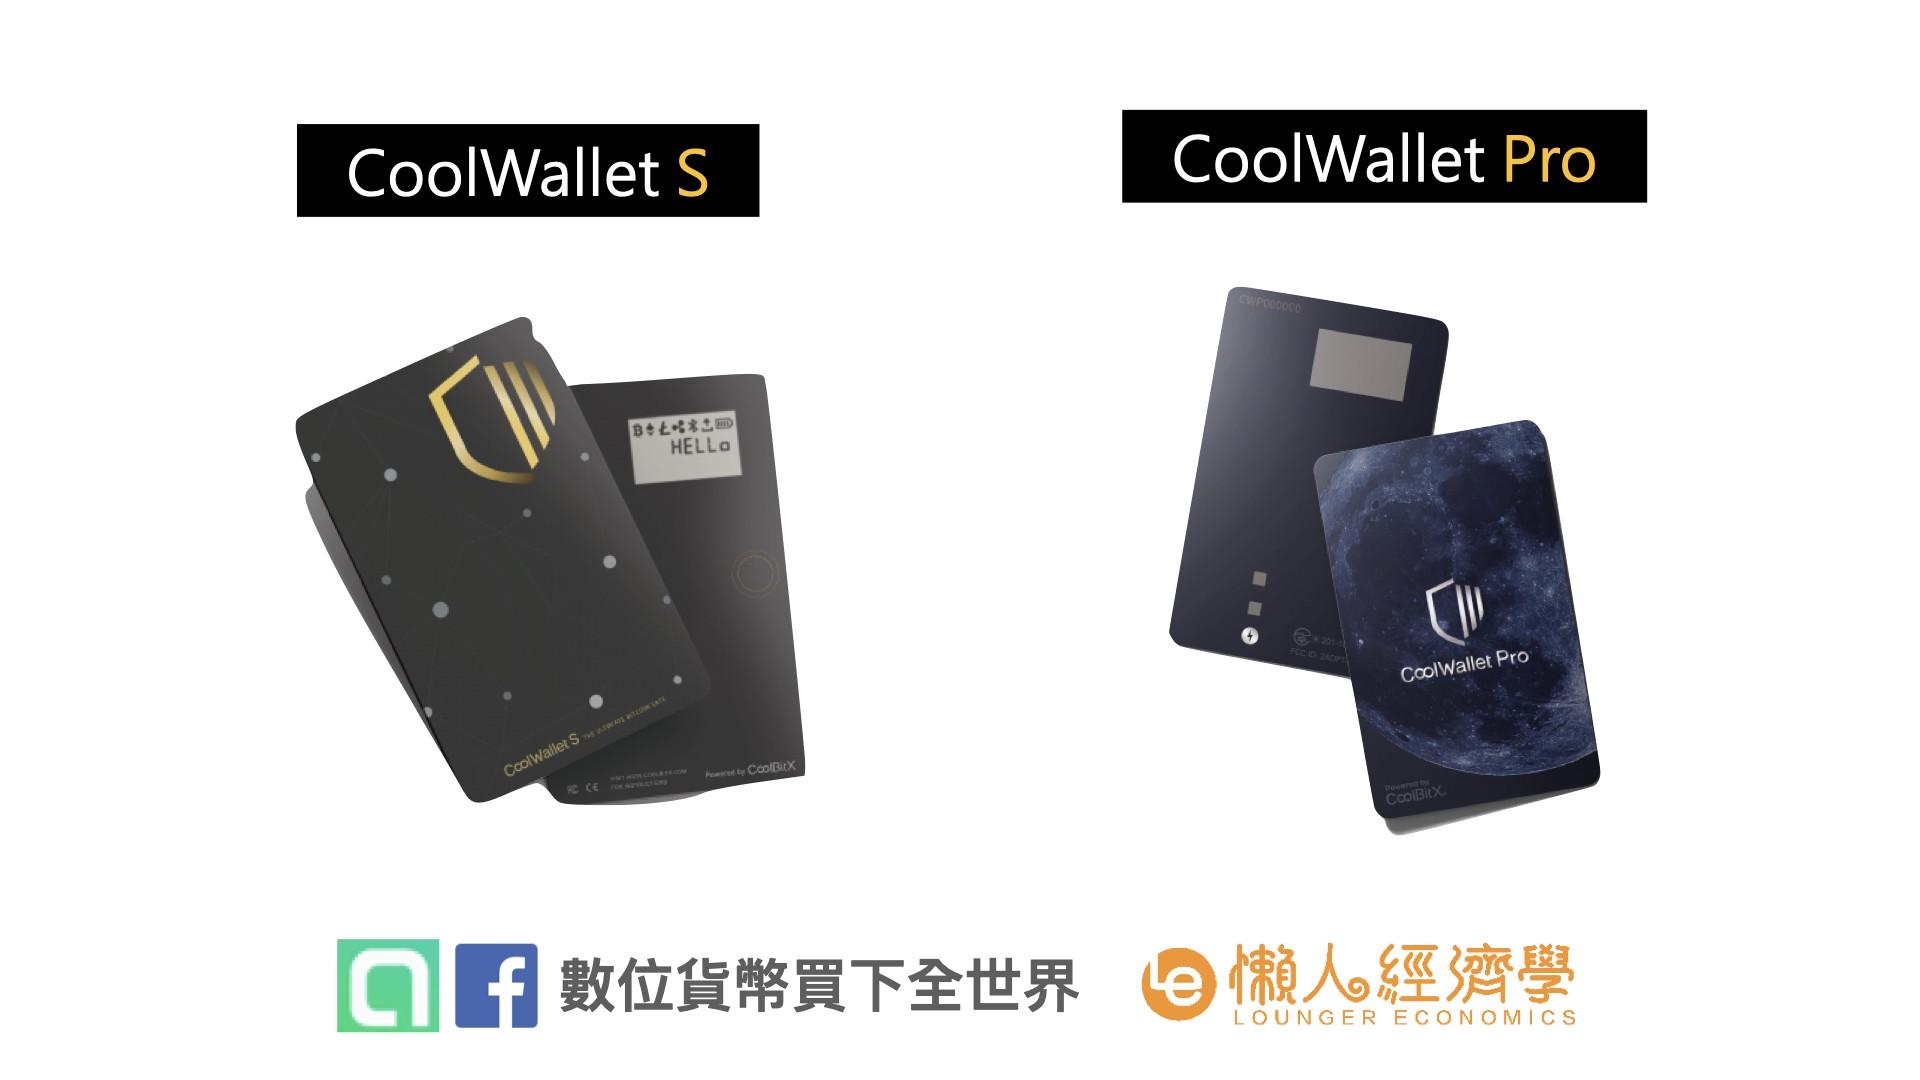 CoolWallet 錢包比較:CoolWallet S與CoolWallet Pro